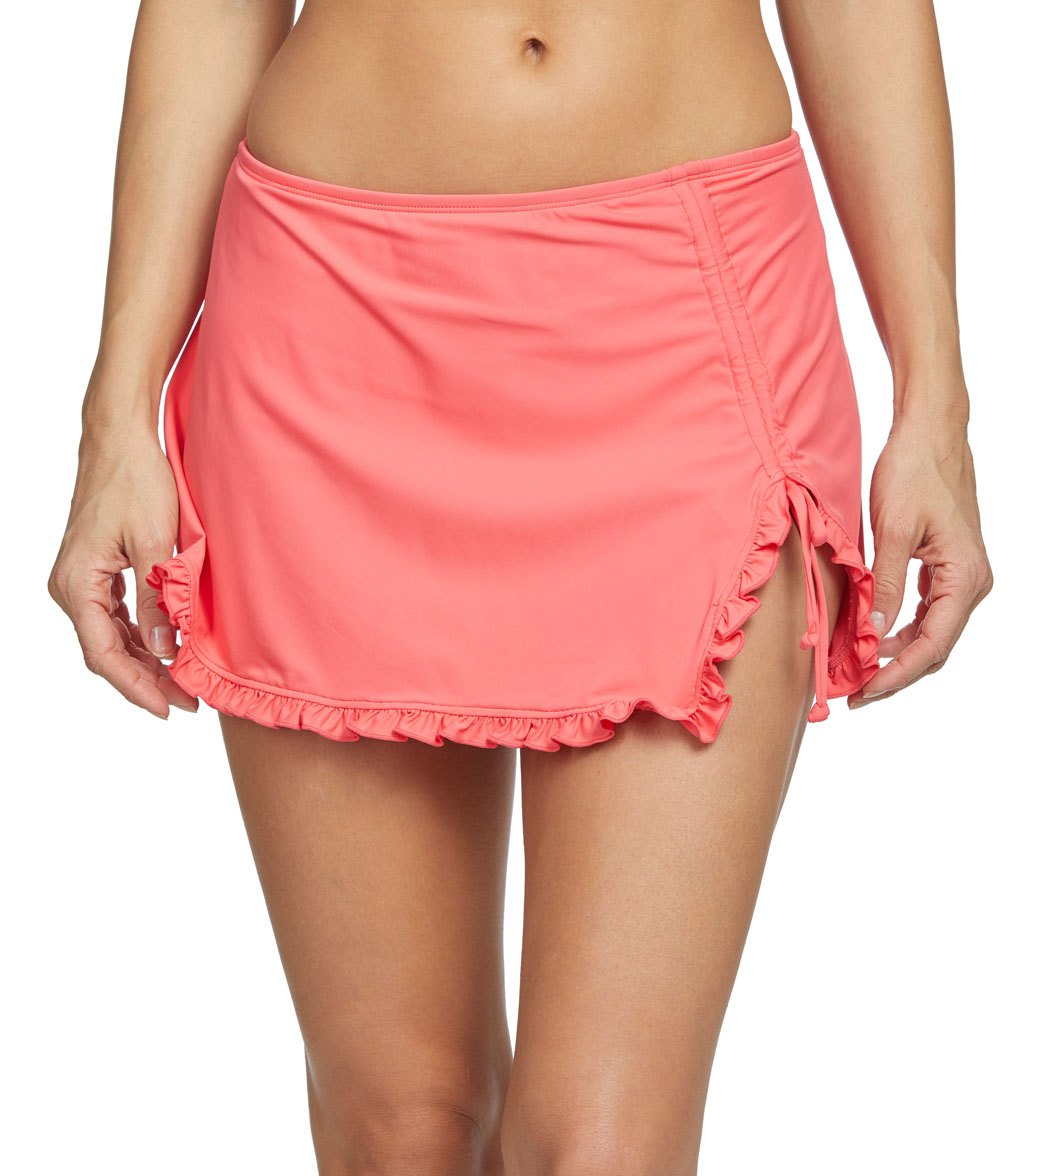 774f6d126 Beach House Paloma Beach Tess Side Tie Swim Skirt at SwimOutlet.com - Free  Shipping